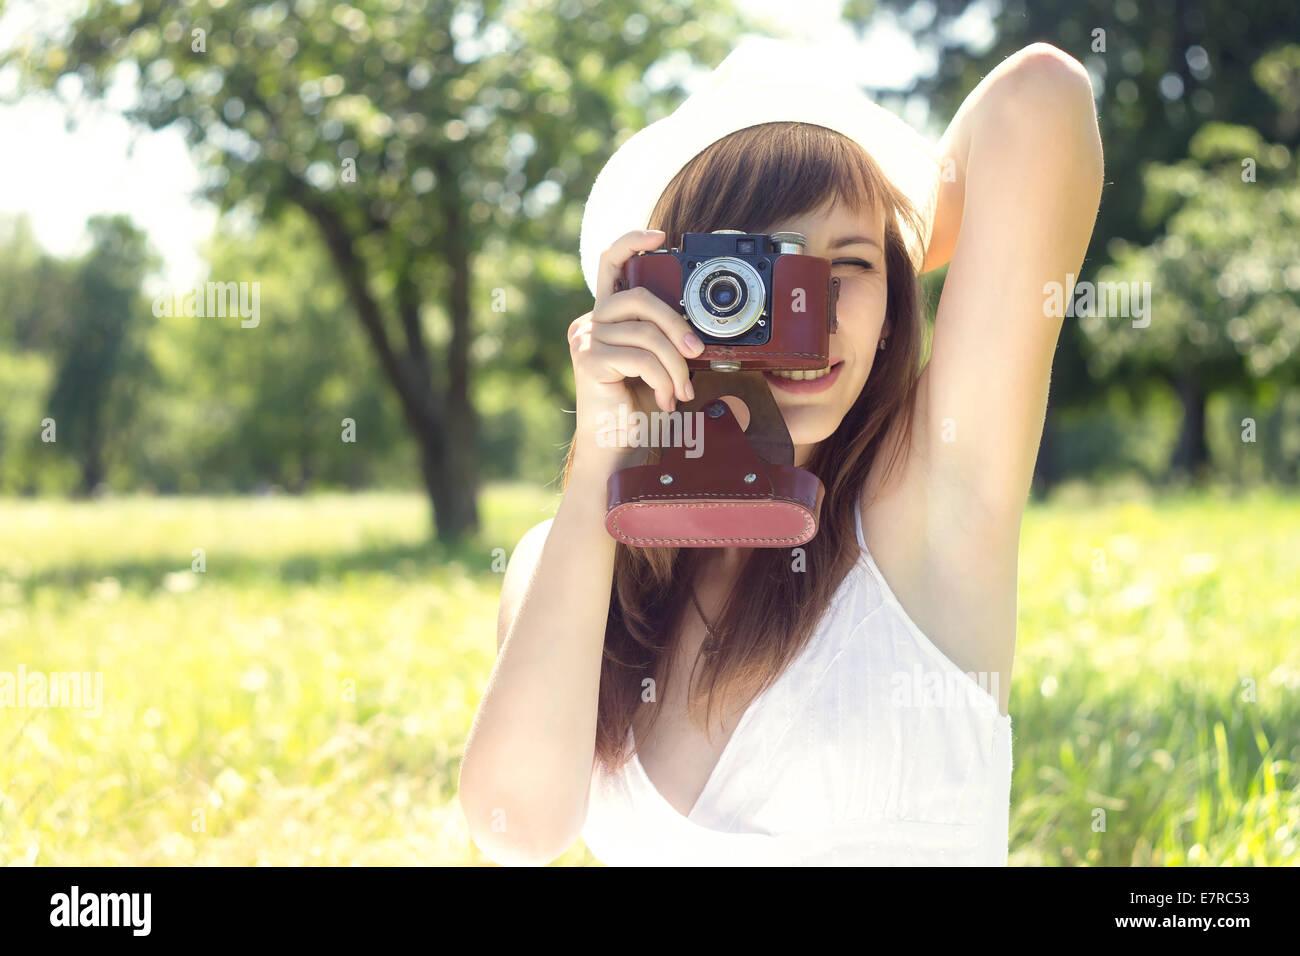 Young Pretty woman posing with film ancien appareil photo en parc d'été. Girl in white hat photographie Photo Stock